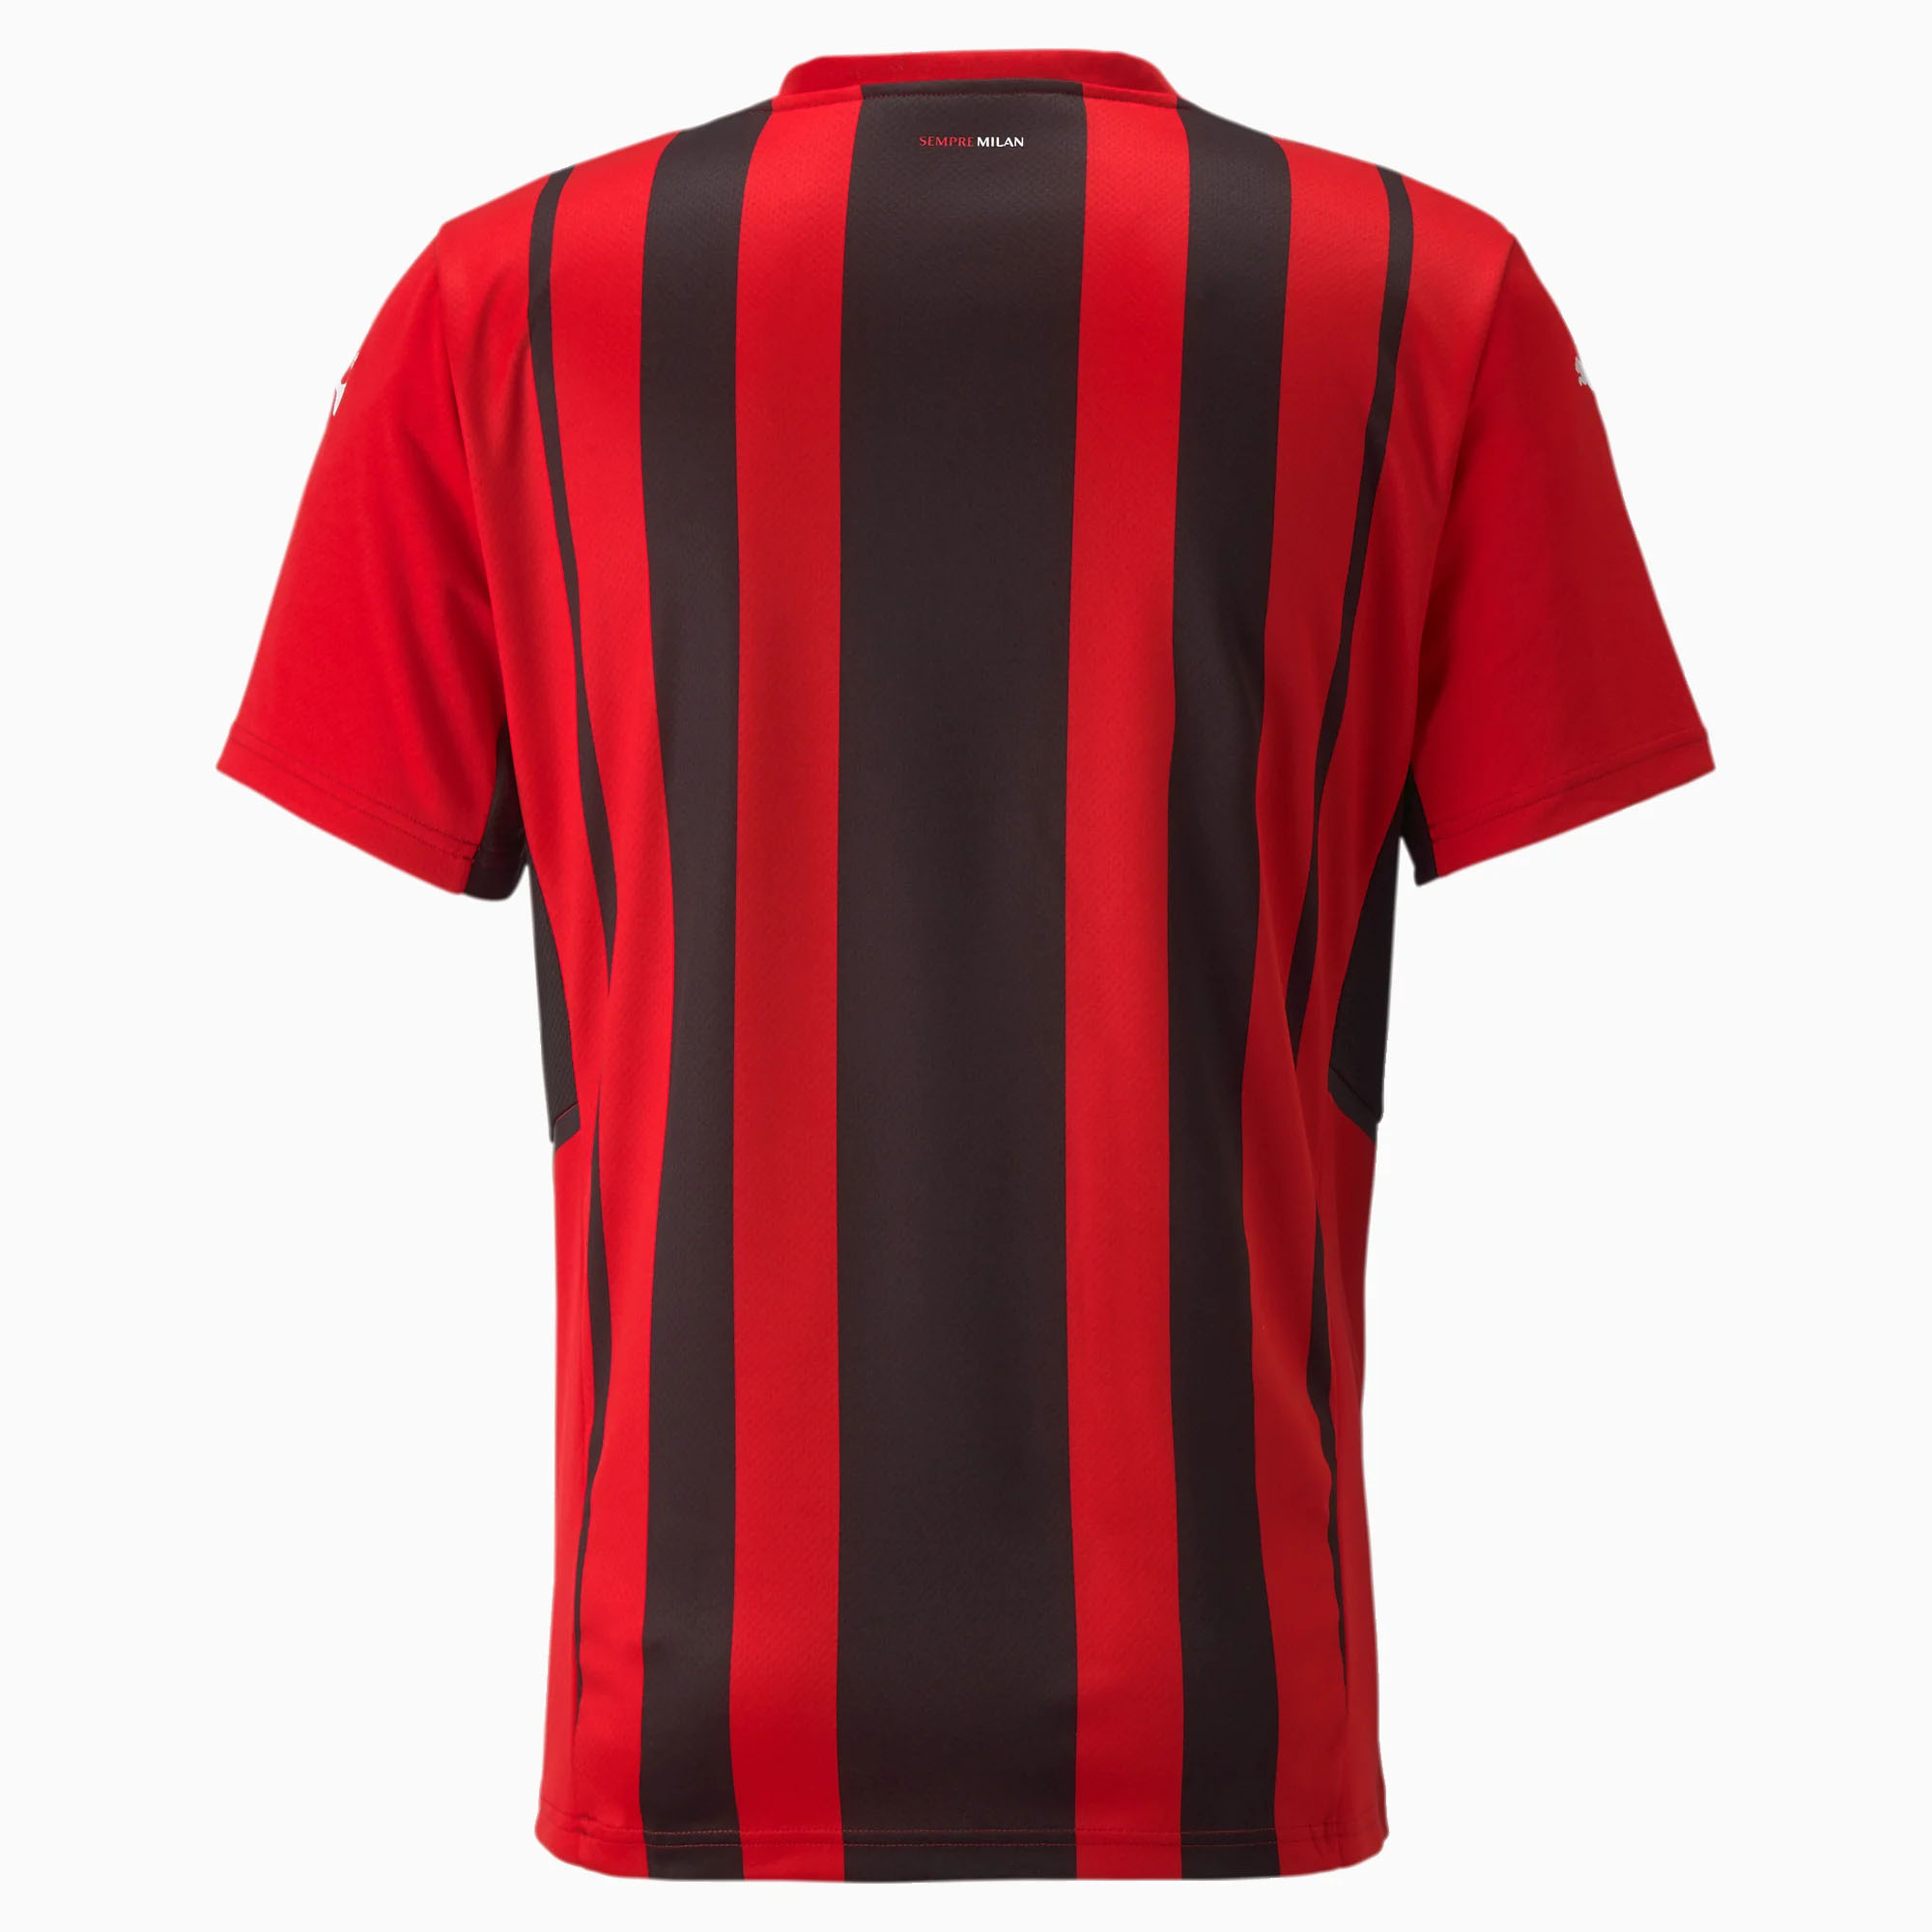 Maglia AC Milan Home 2021/22 Puma PUMA | 270000021 | 759122001